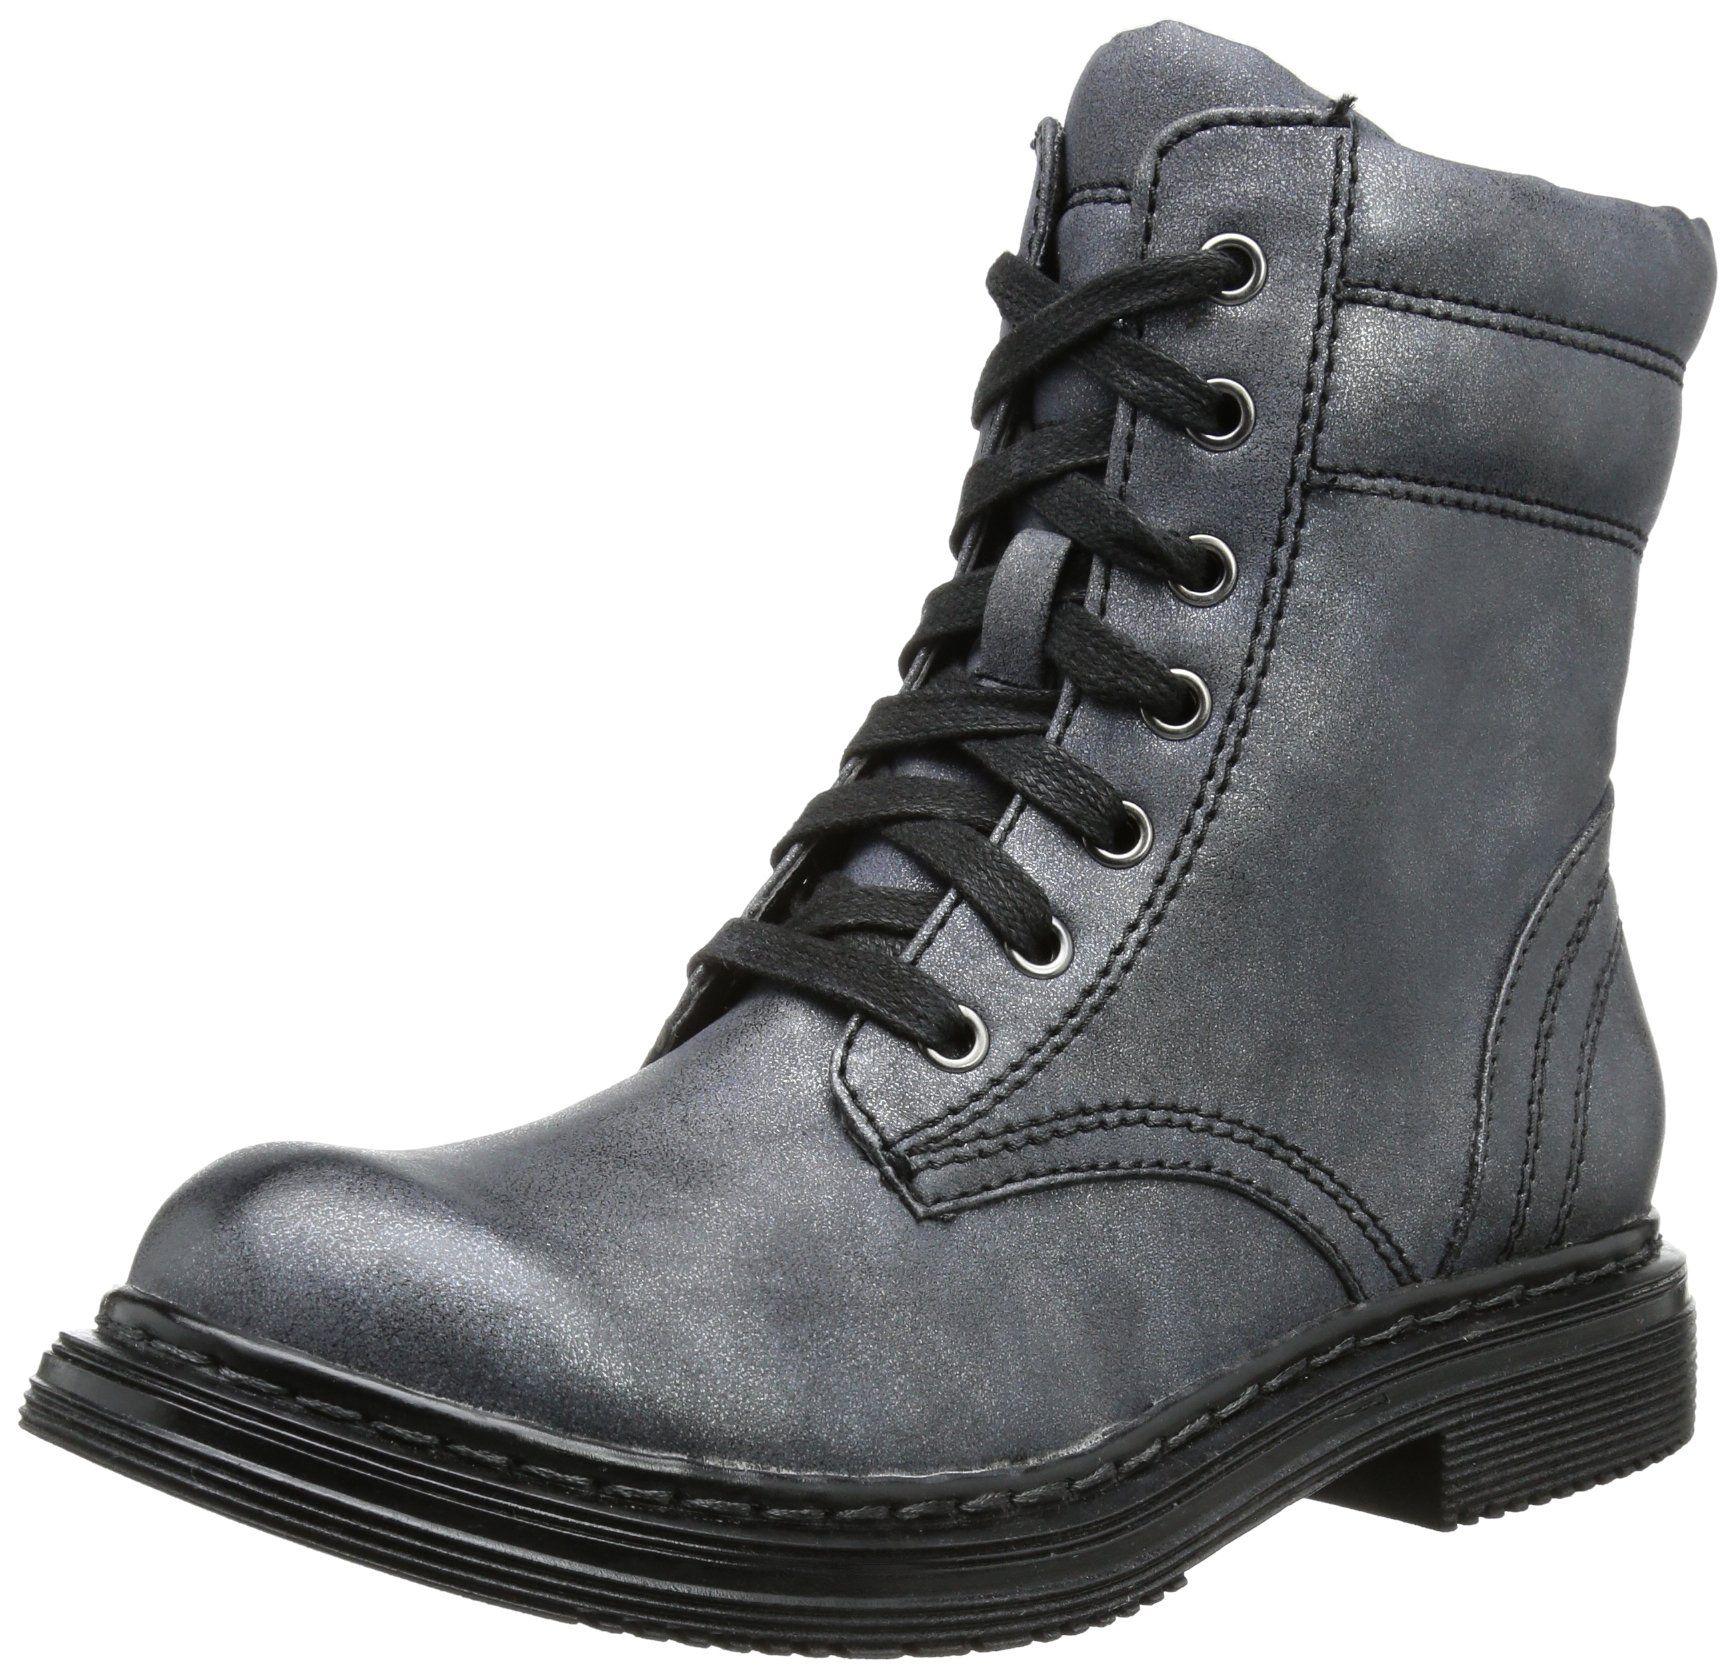 Zapatos negros formales Marco Tozzi para mujer JCtW3UOV0i